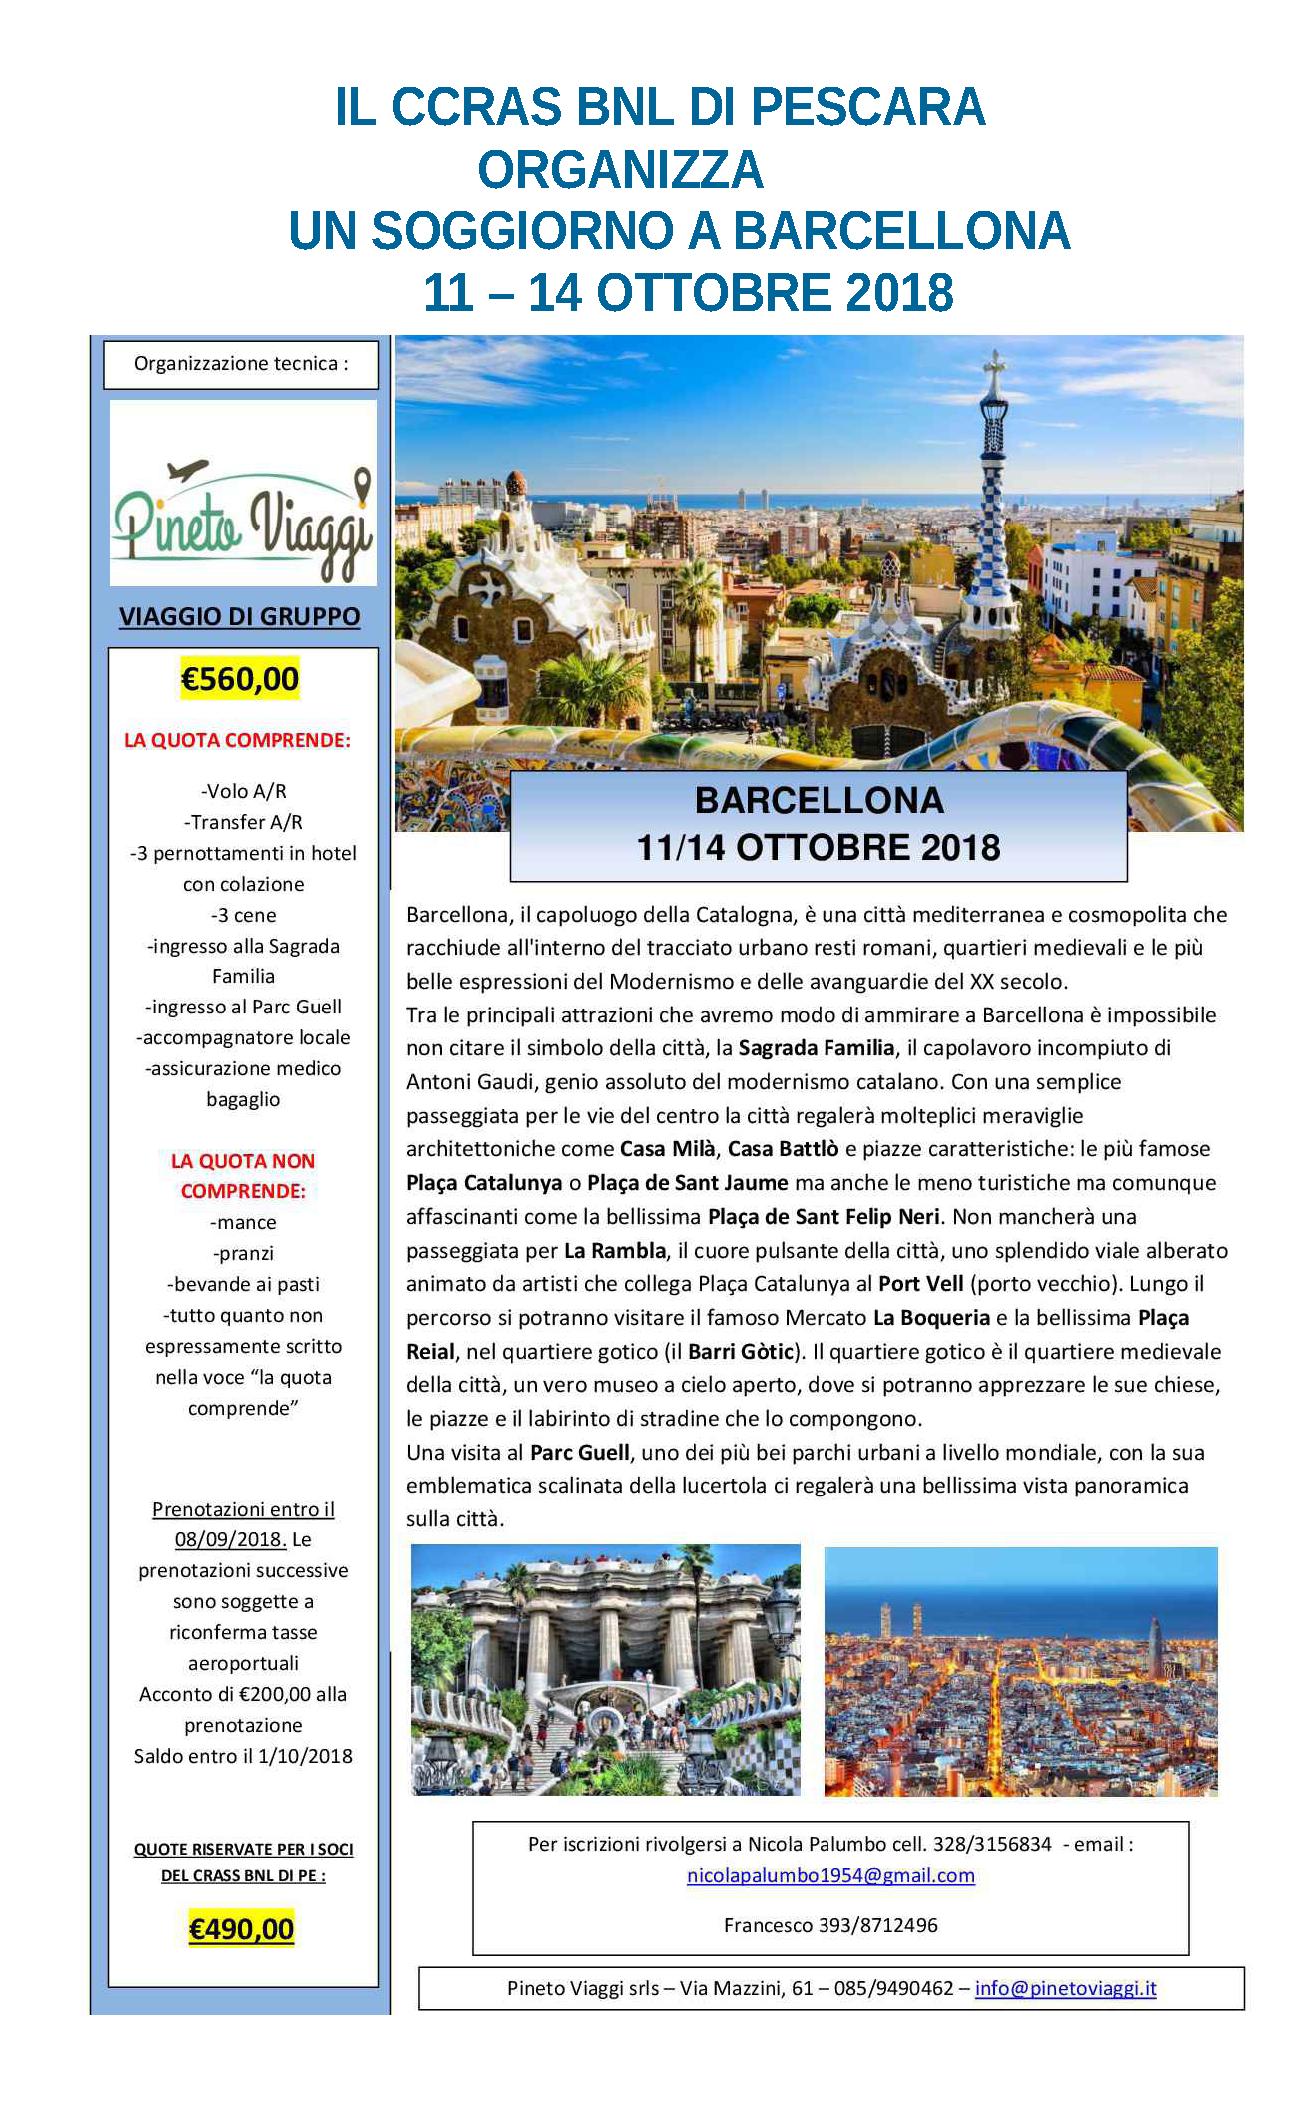 CCRAS BNL -Soggiorno a Barcellona 11/14 settembre 2018 | Intercral ...